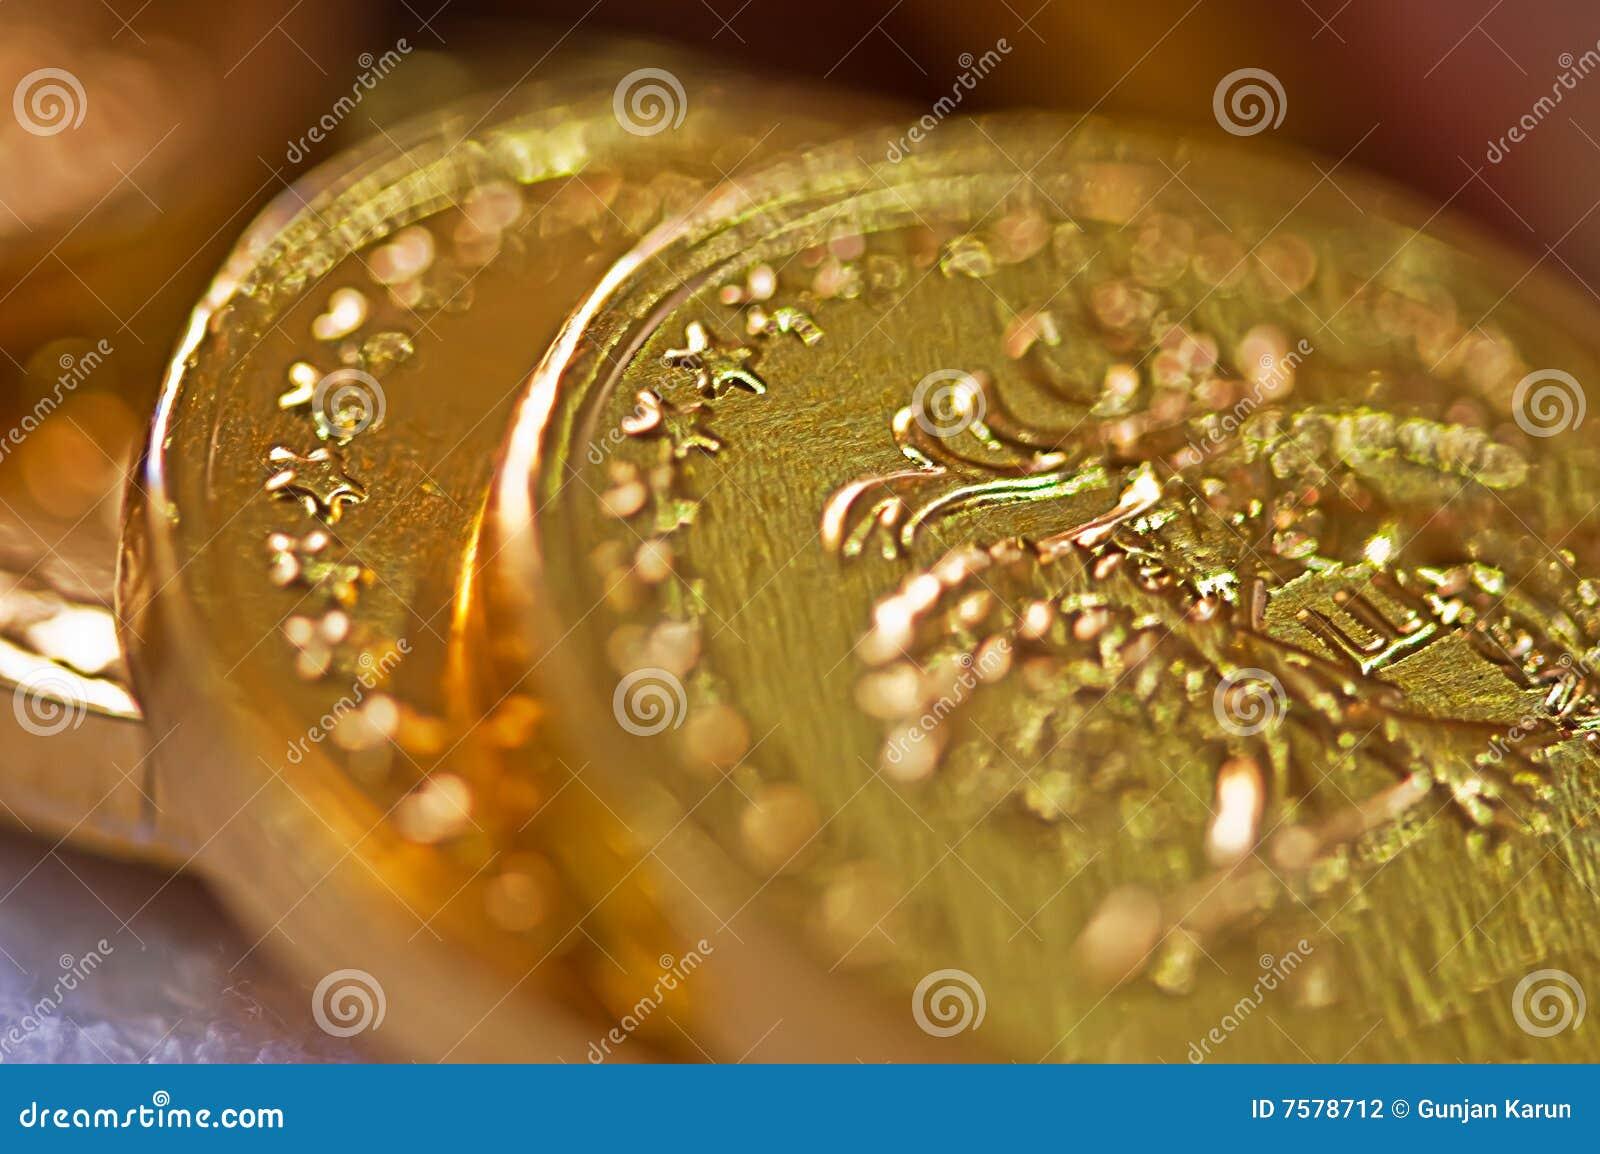 Makro der Goldmünzen